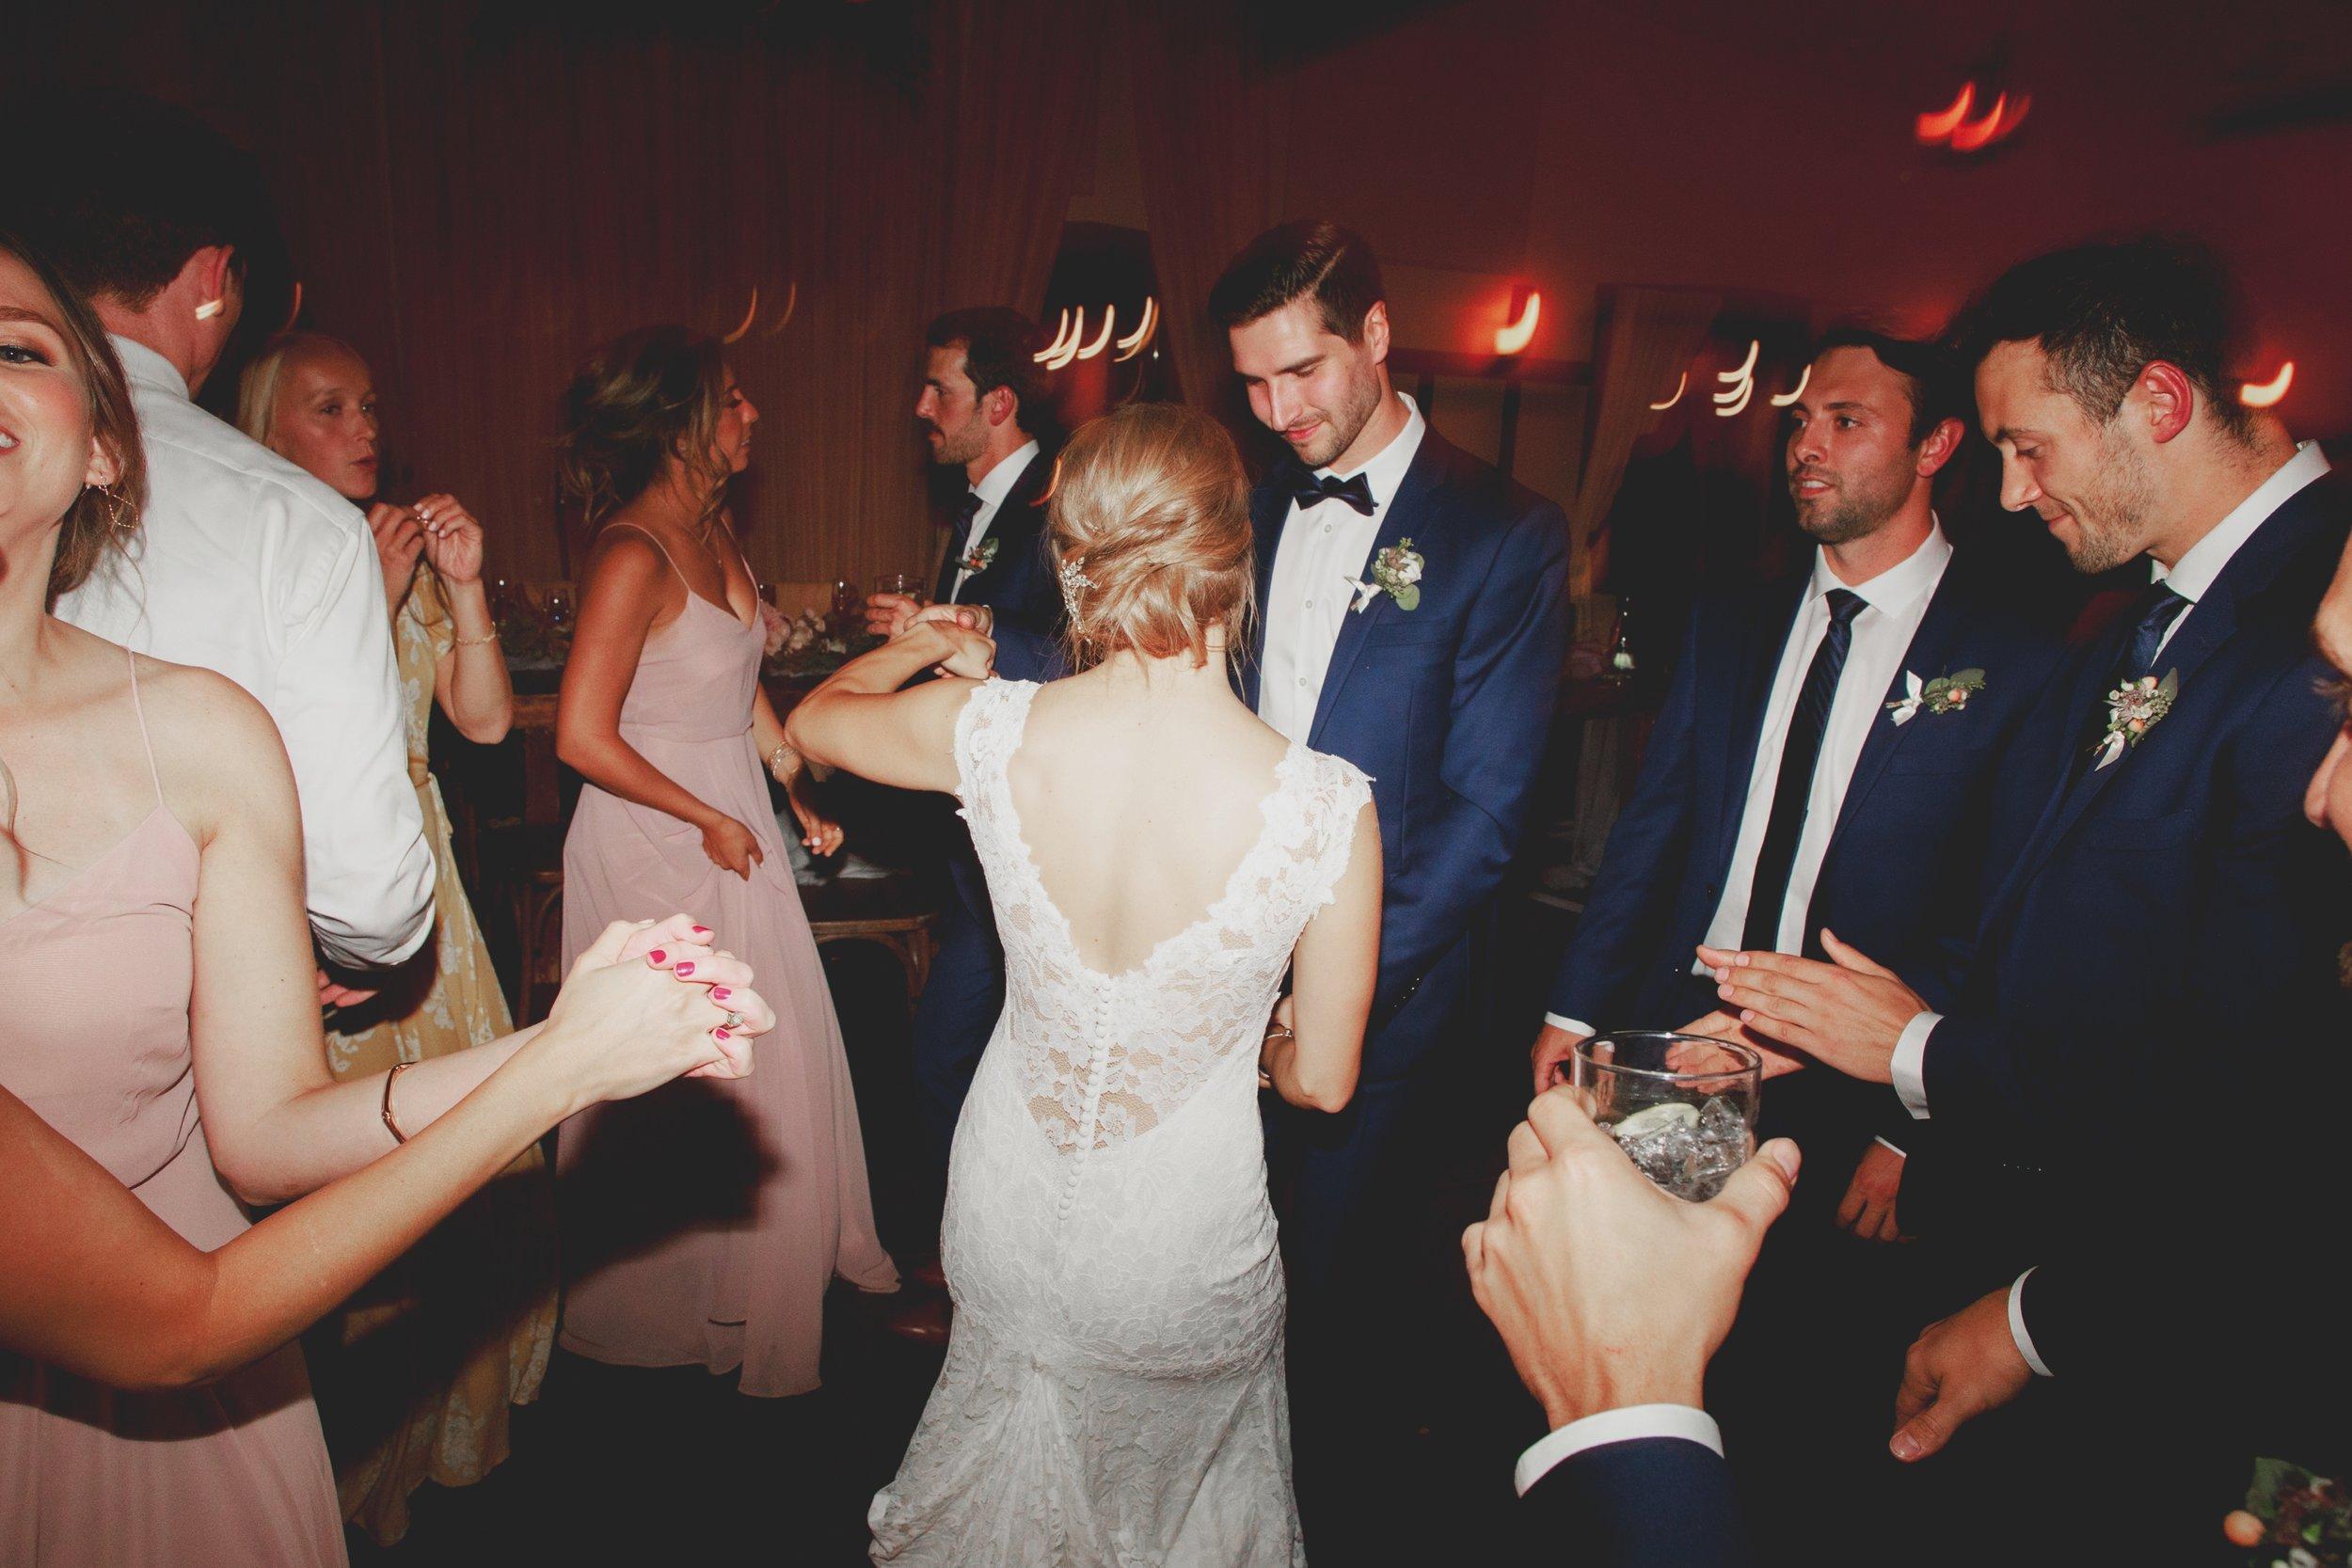 traverse_city_wedding_172.jpg